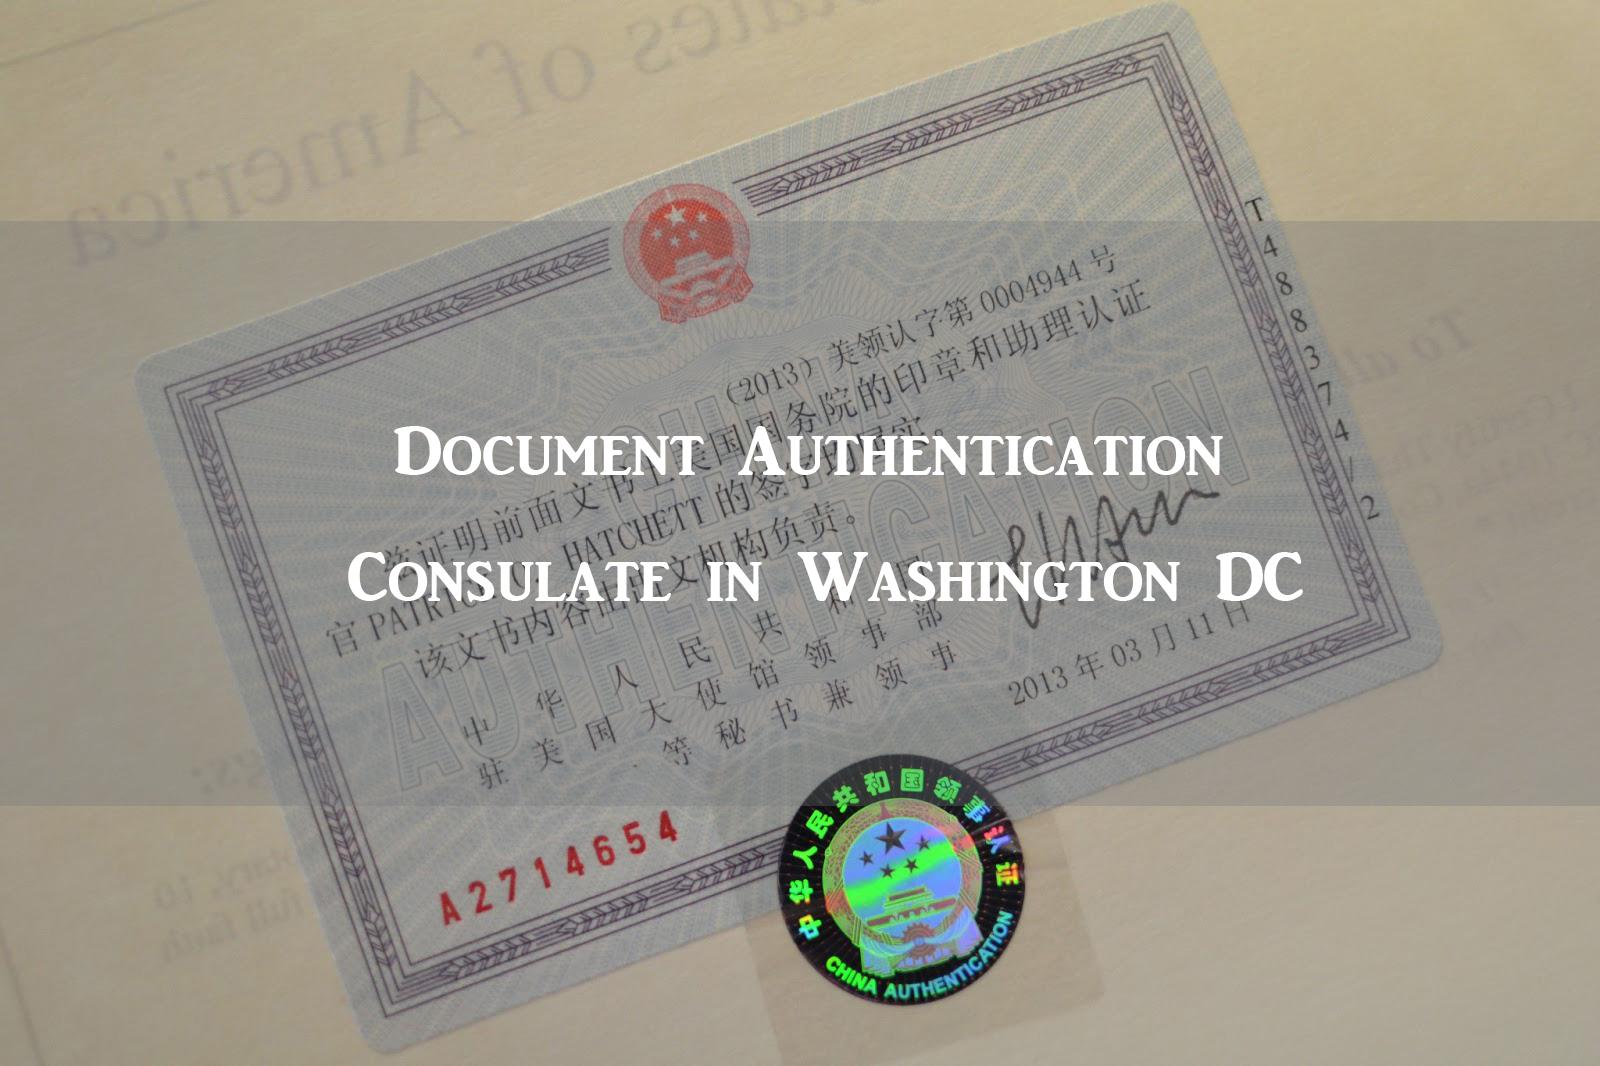 Document authentication consulate in washington dc visa for Consul authentication